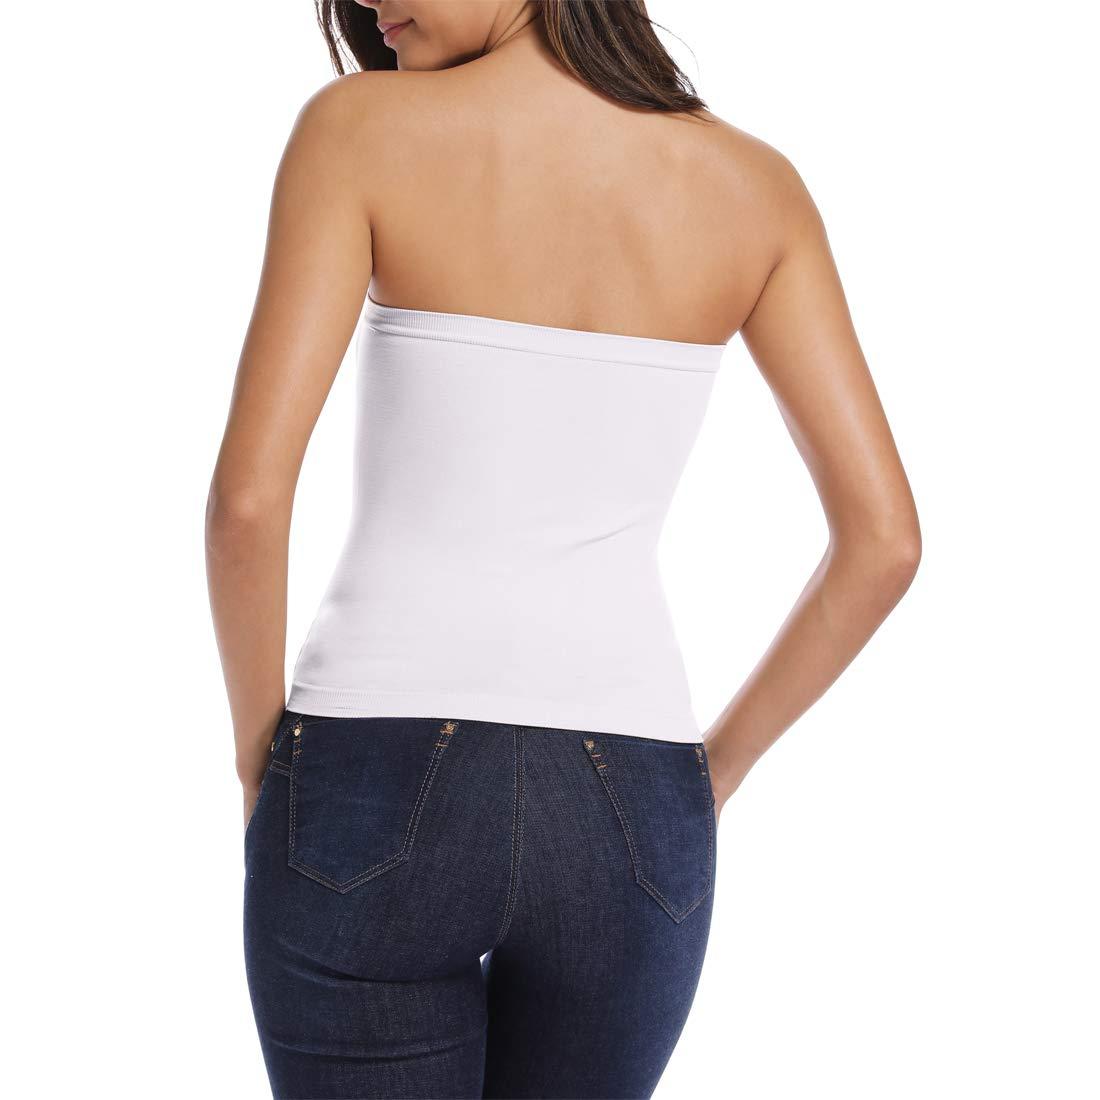 Joyshaper Medium Length Bandeau Bra Top Strapless Tube Top for Women Cropped Tube Tops Seamless Crop Tops